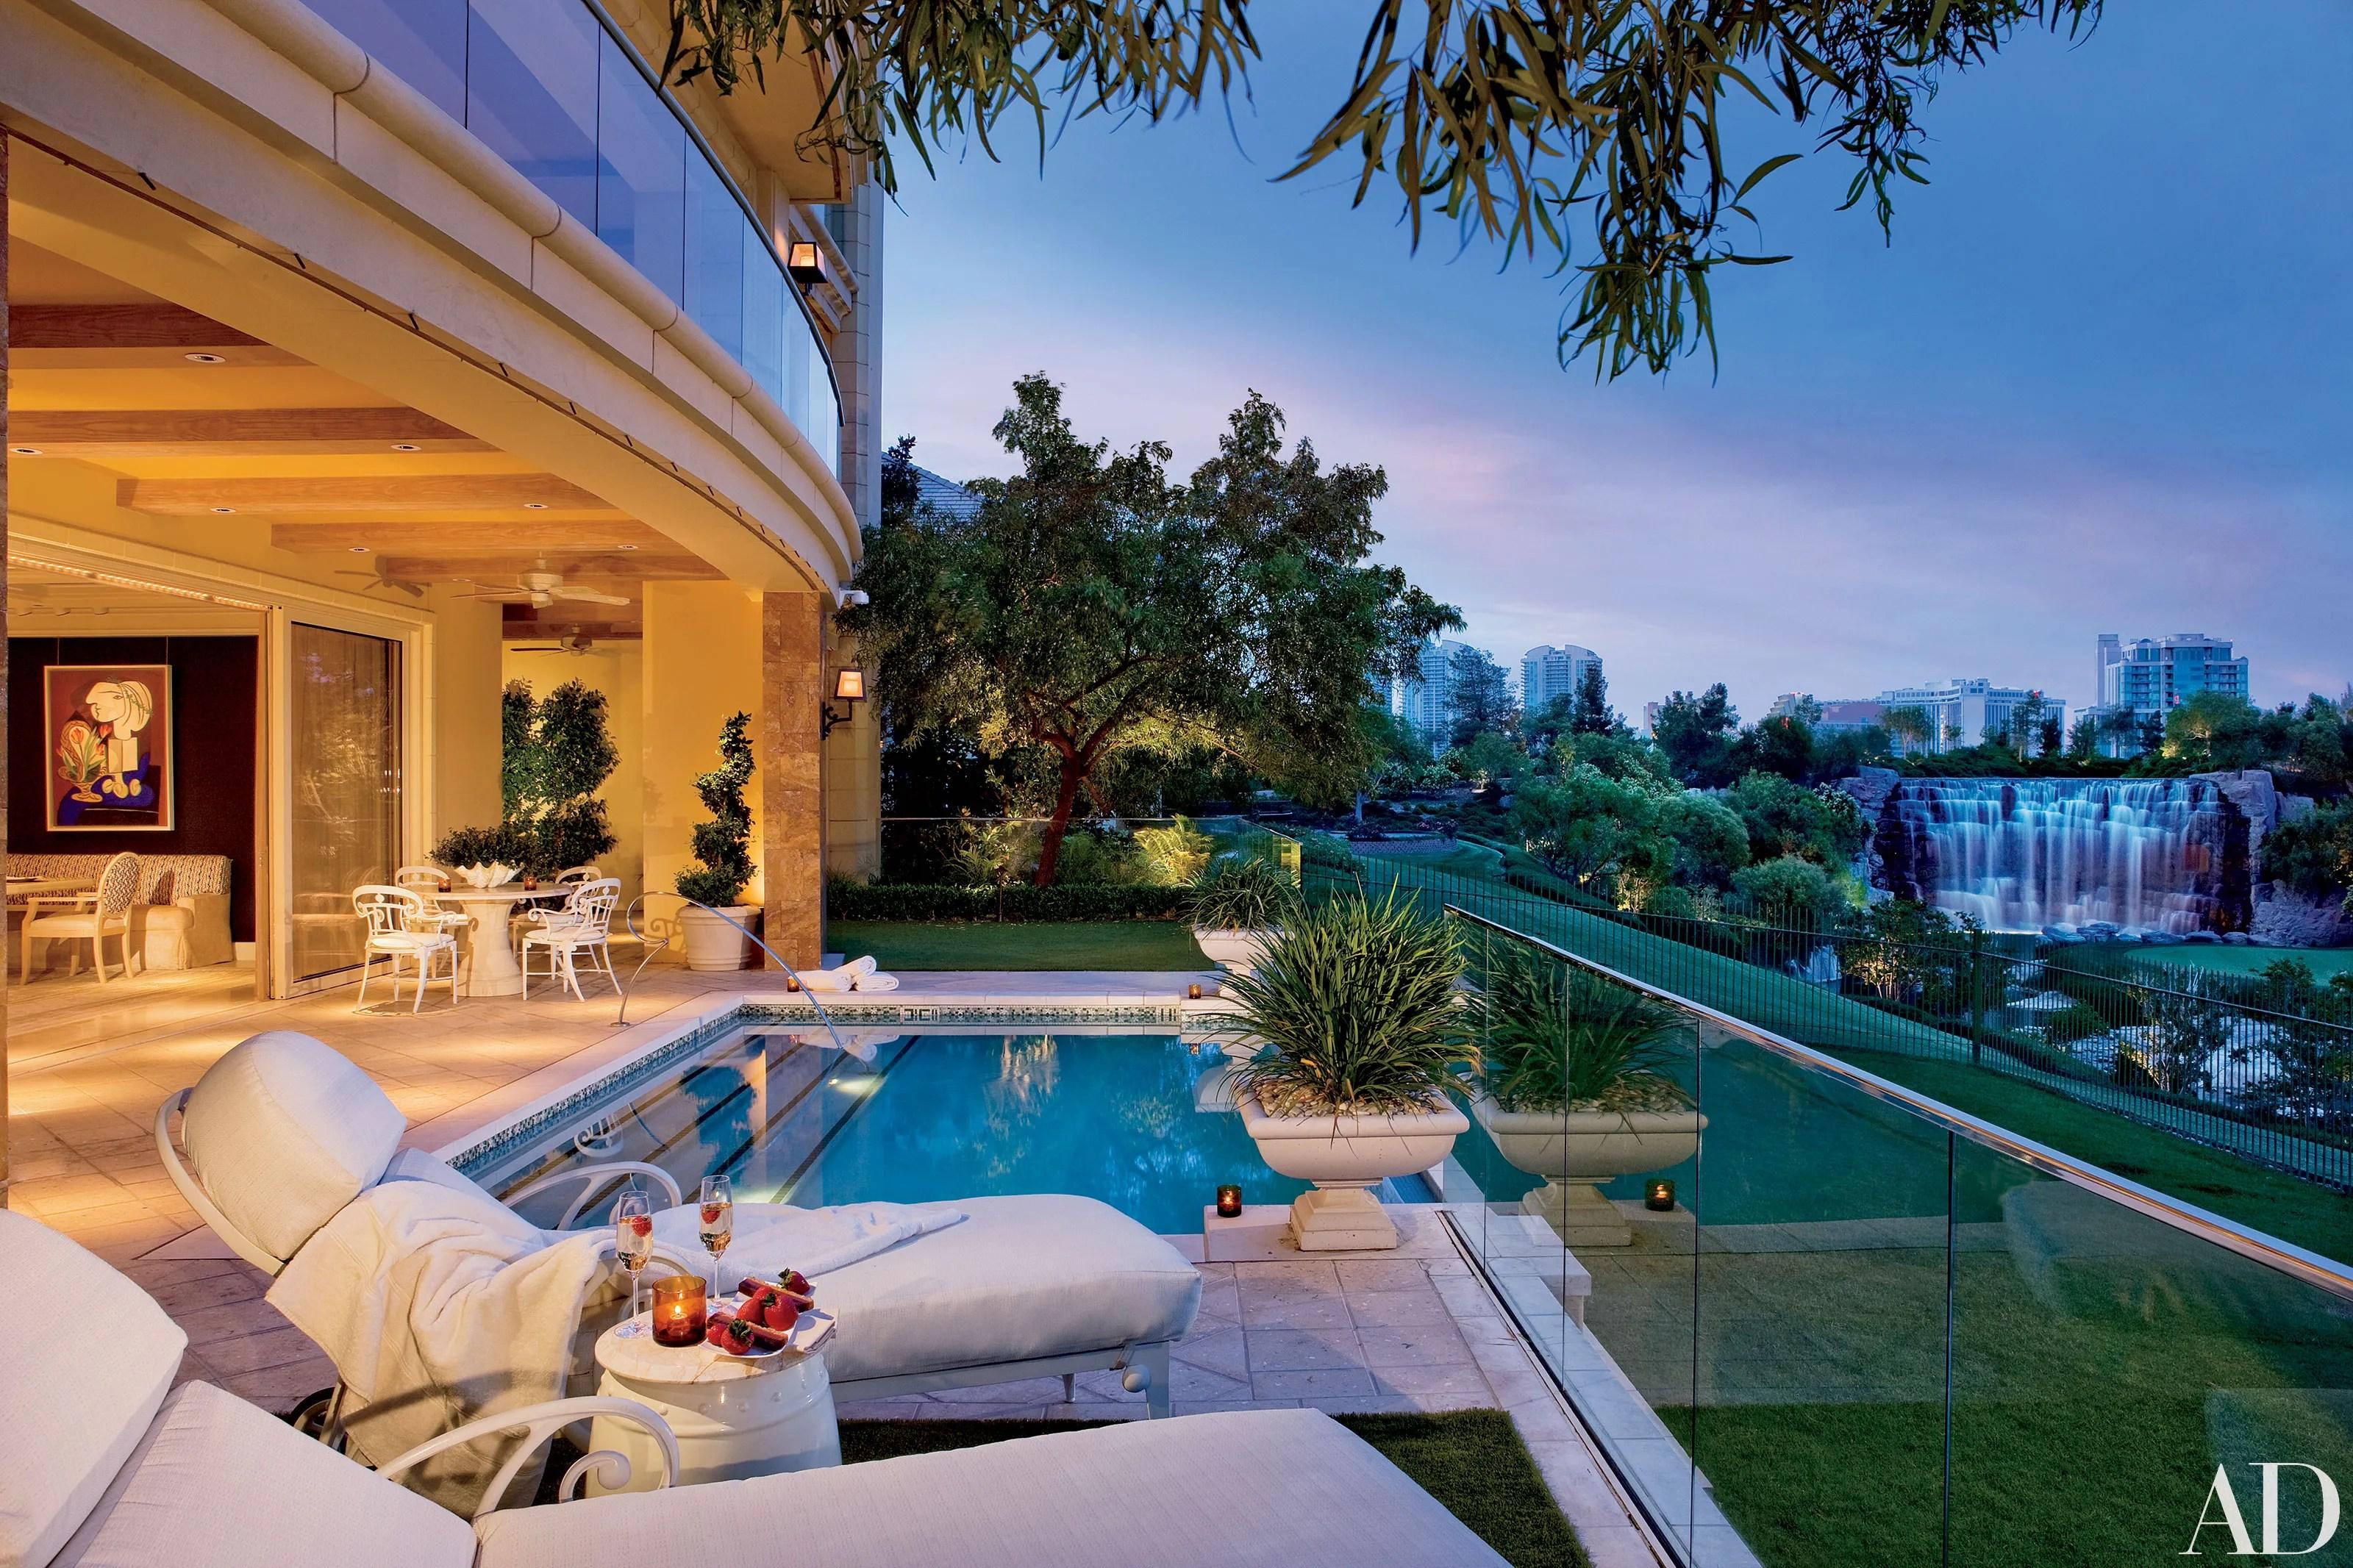 Steve Wynns Picturesque Las Vegas Residence